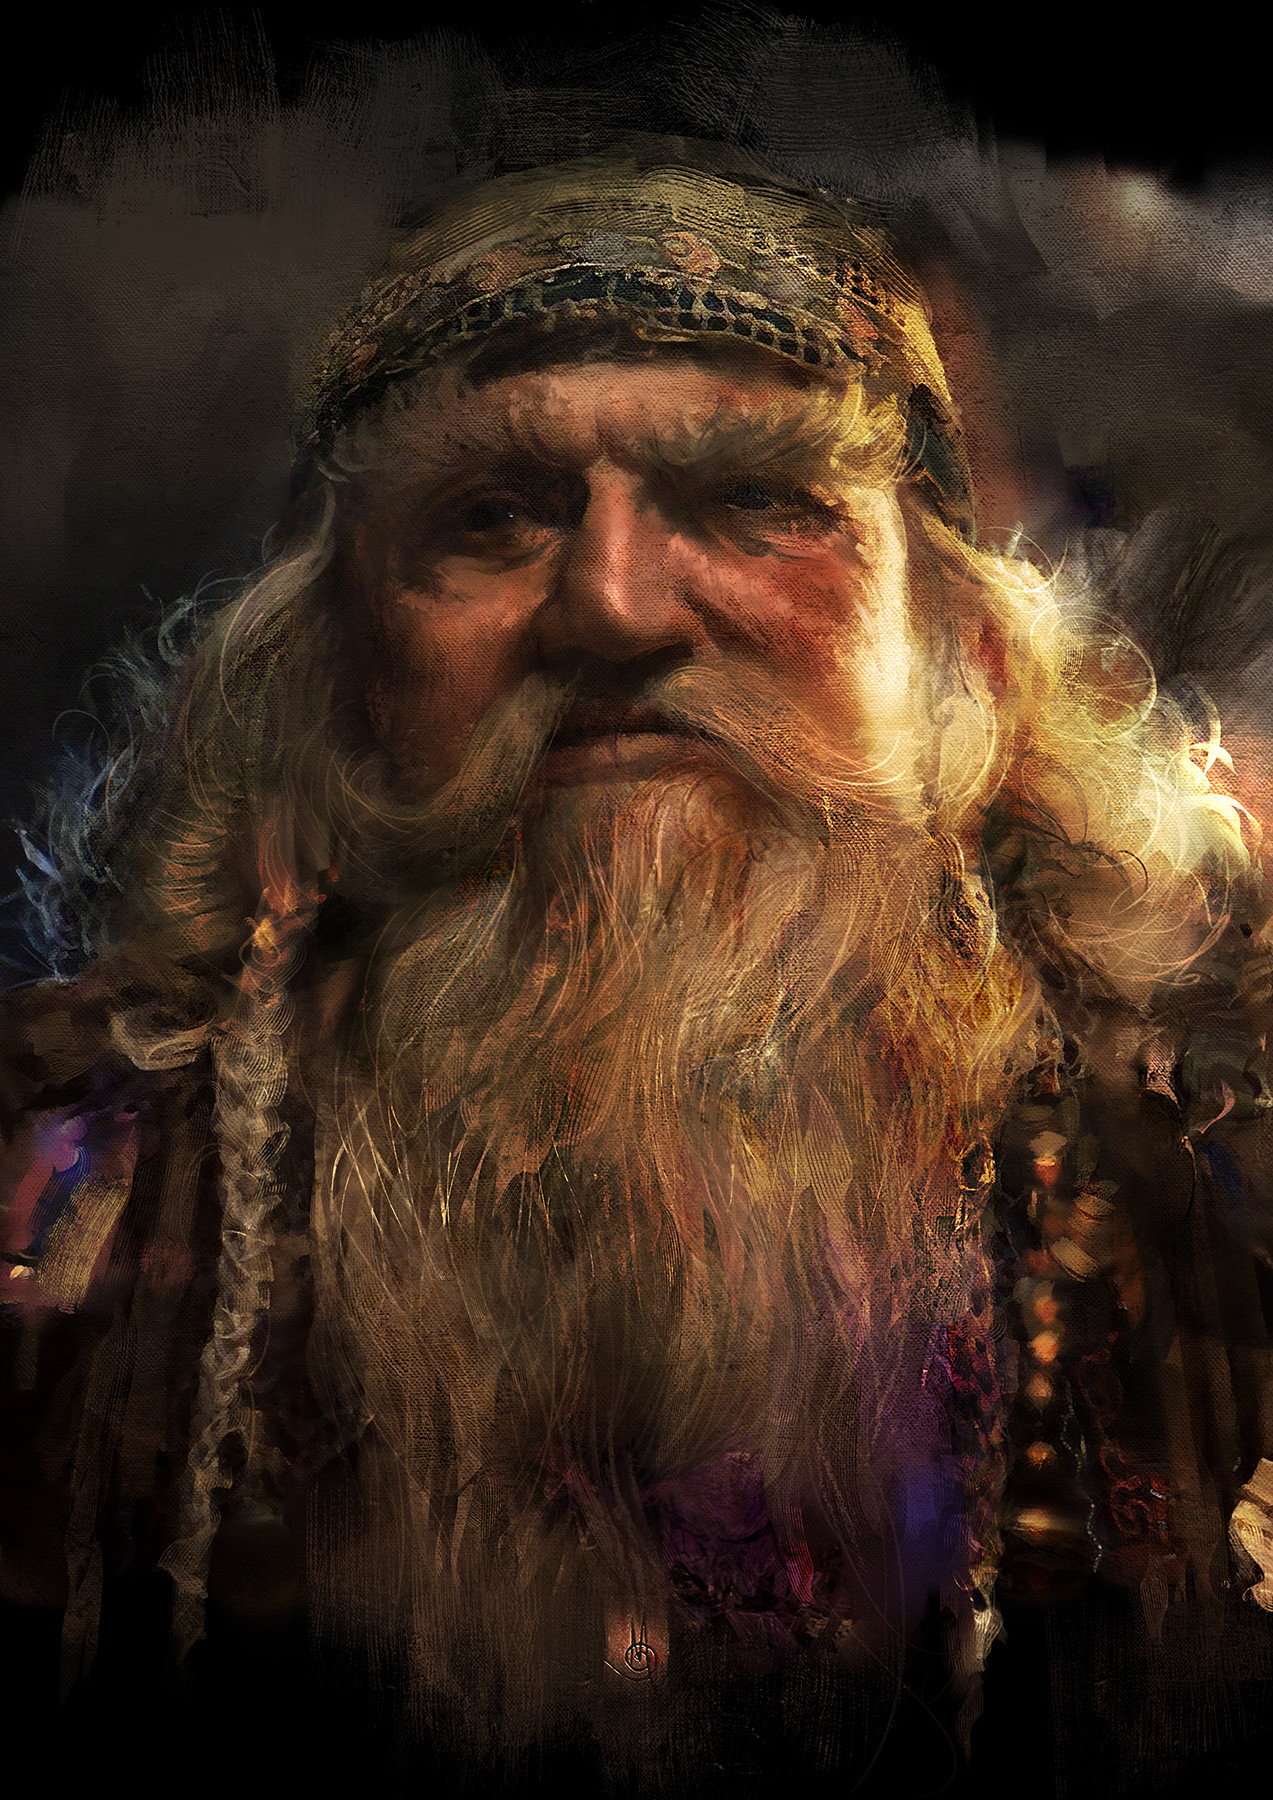 Murat gul wizard by muratgul